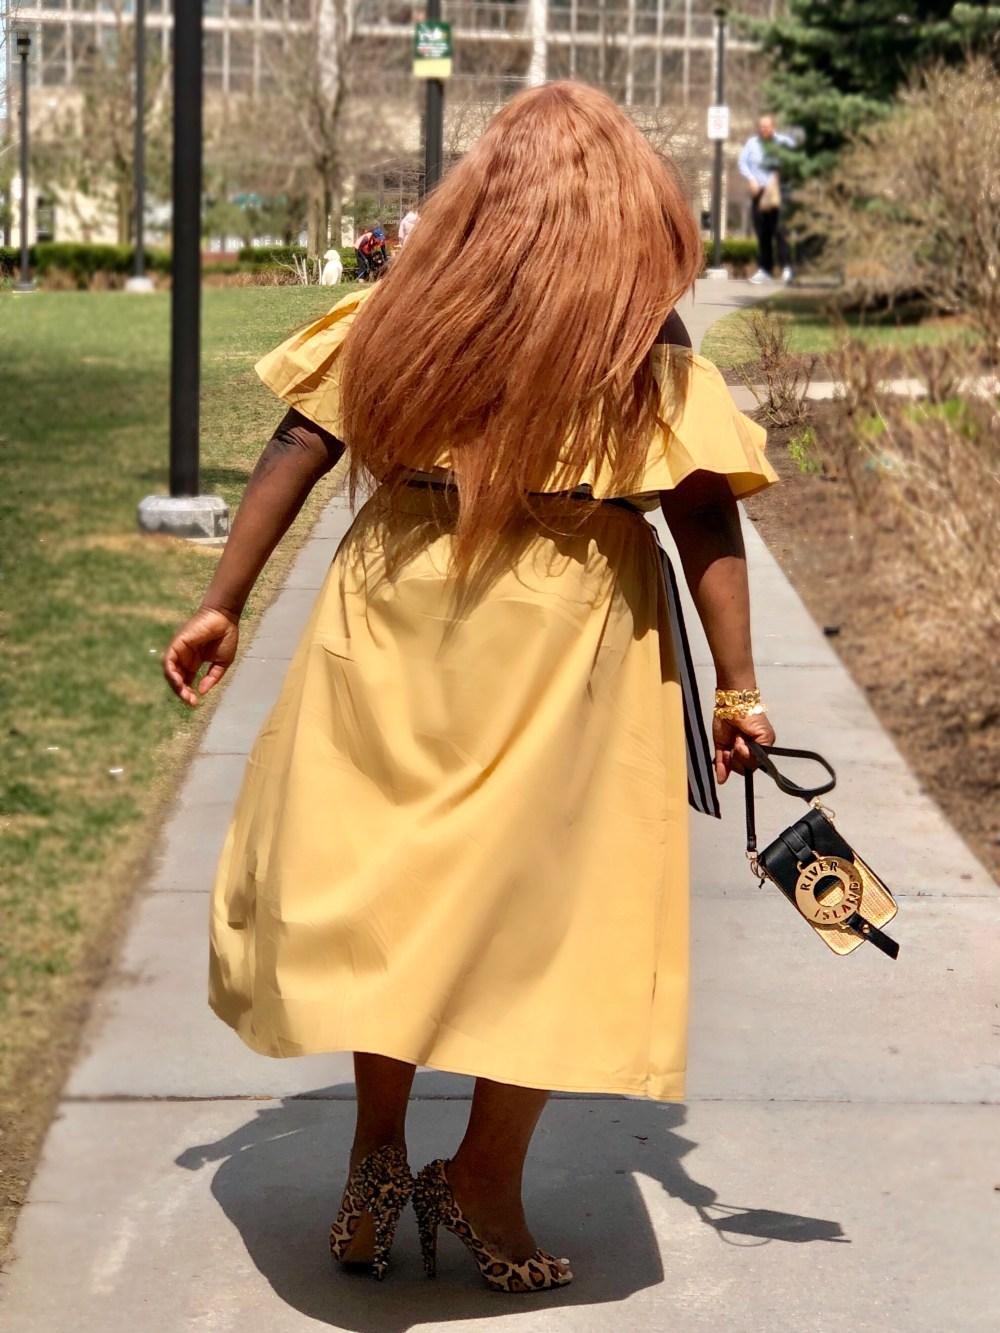 plus size fashion Shoulder Ruffle Midi Dress - Who What Wear Tan - plus size - rivers island - sam eldman - plus size blogger - chicago blogger